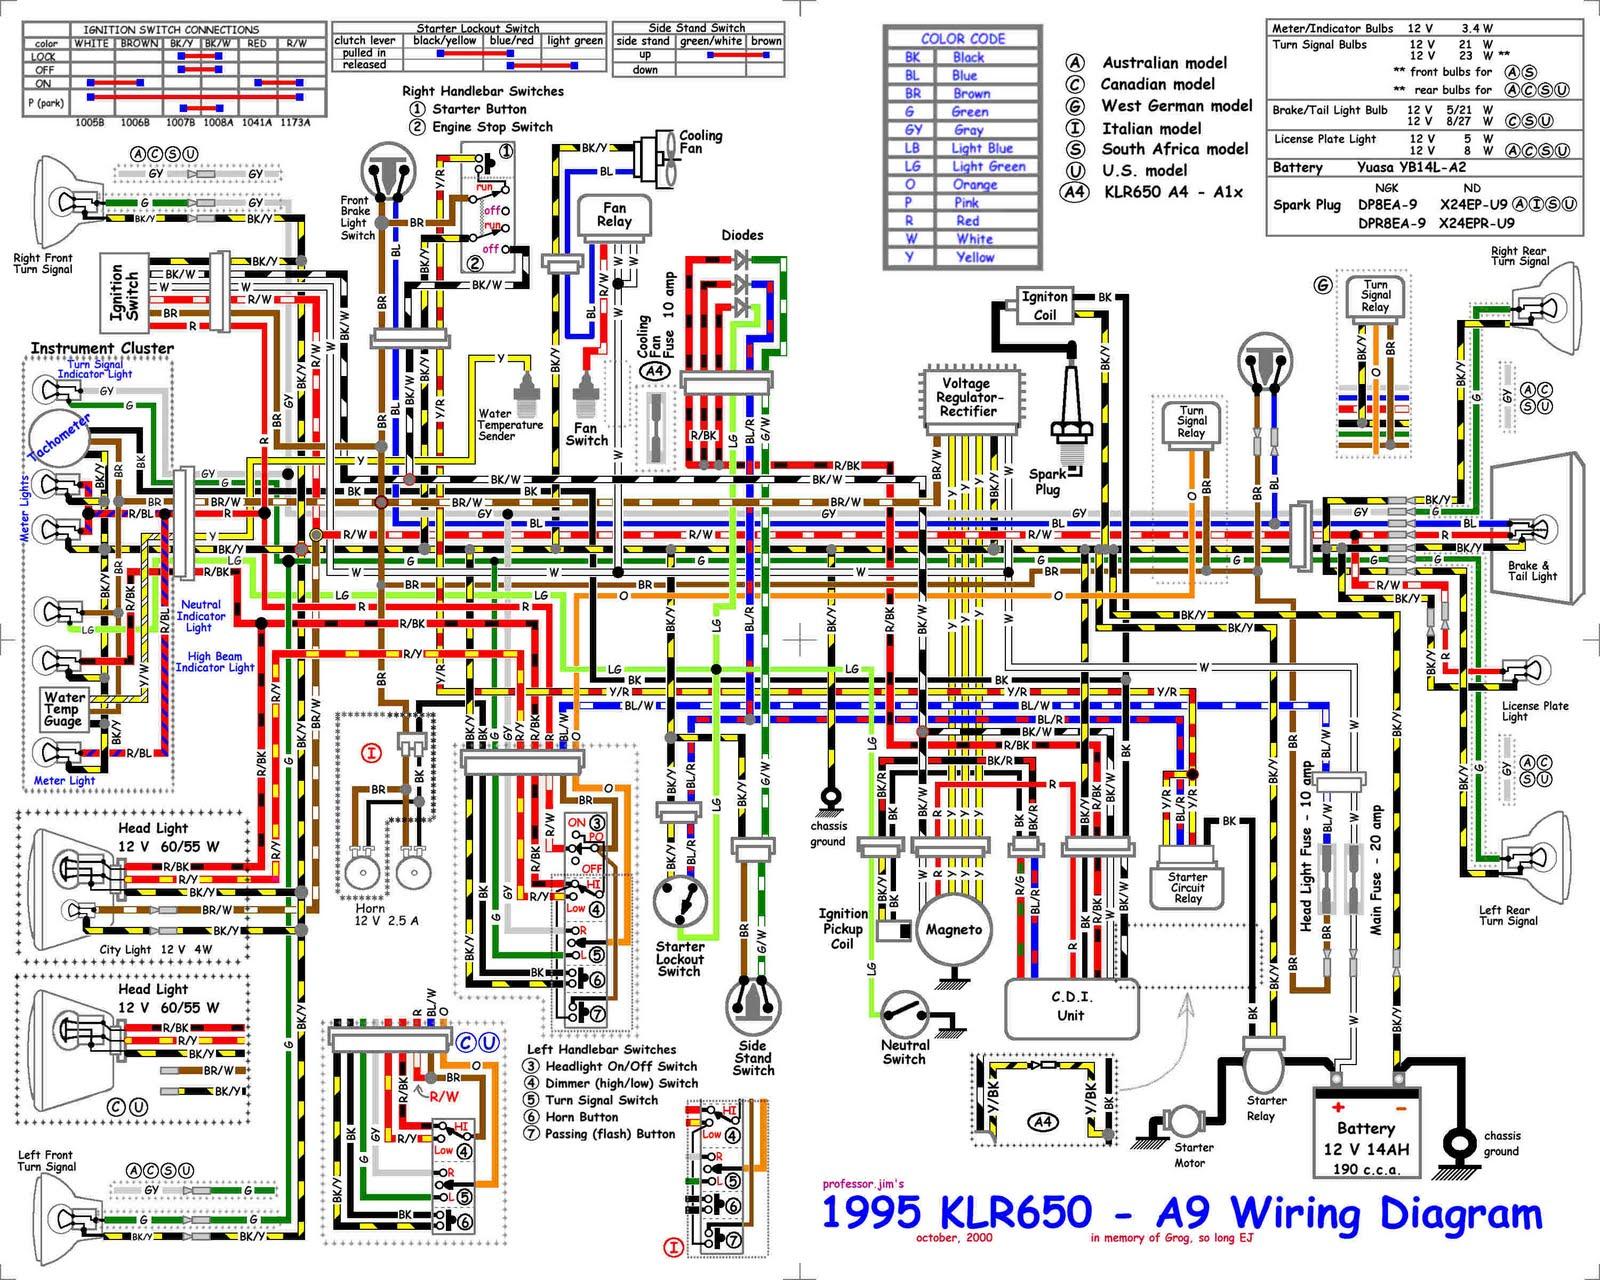 Free Auto Wiring Diagram: 1974 Chevrolet Monte Carlo